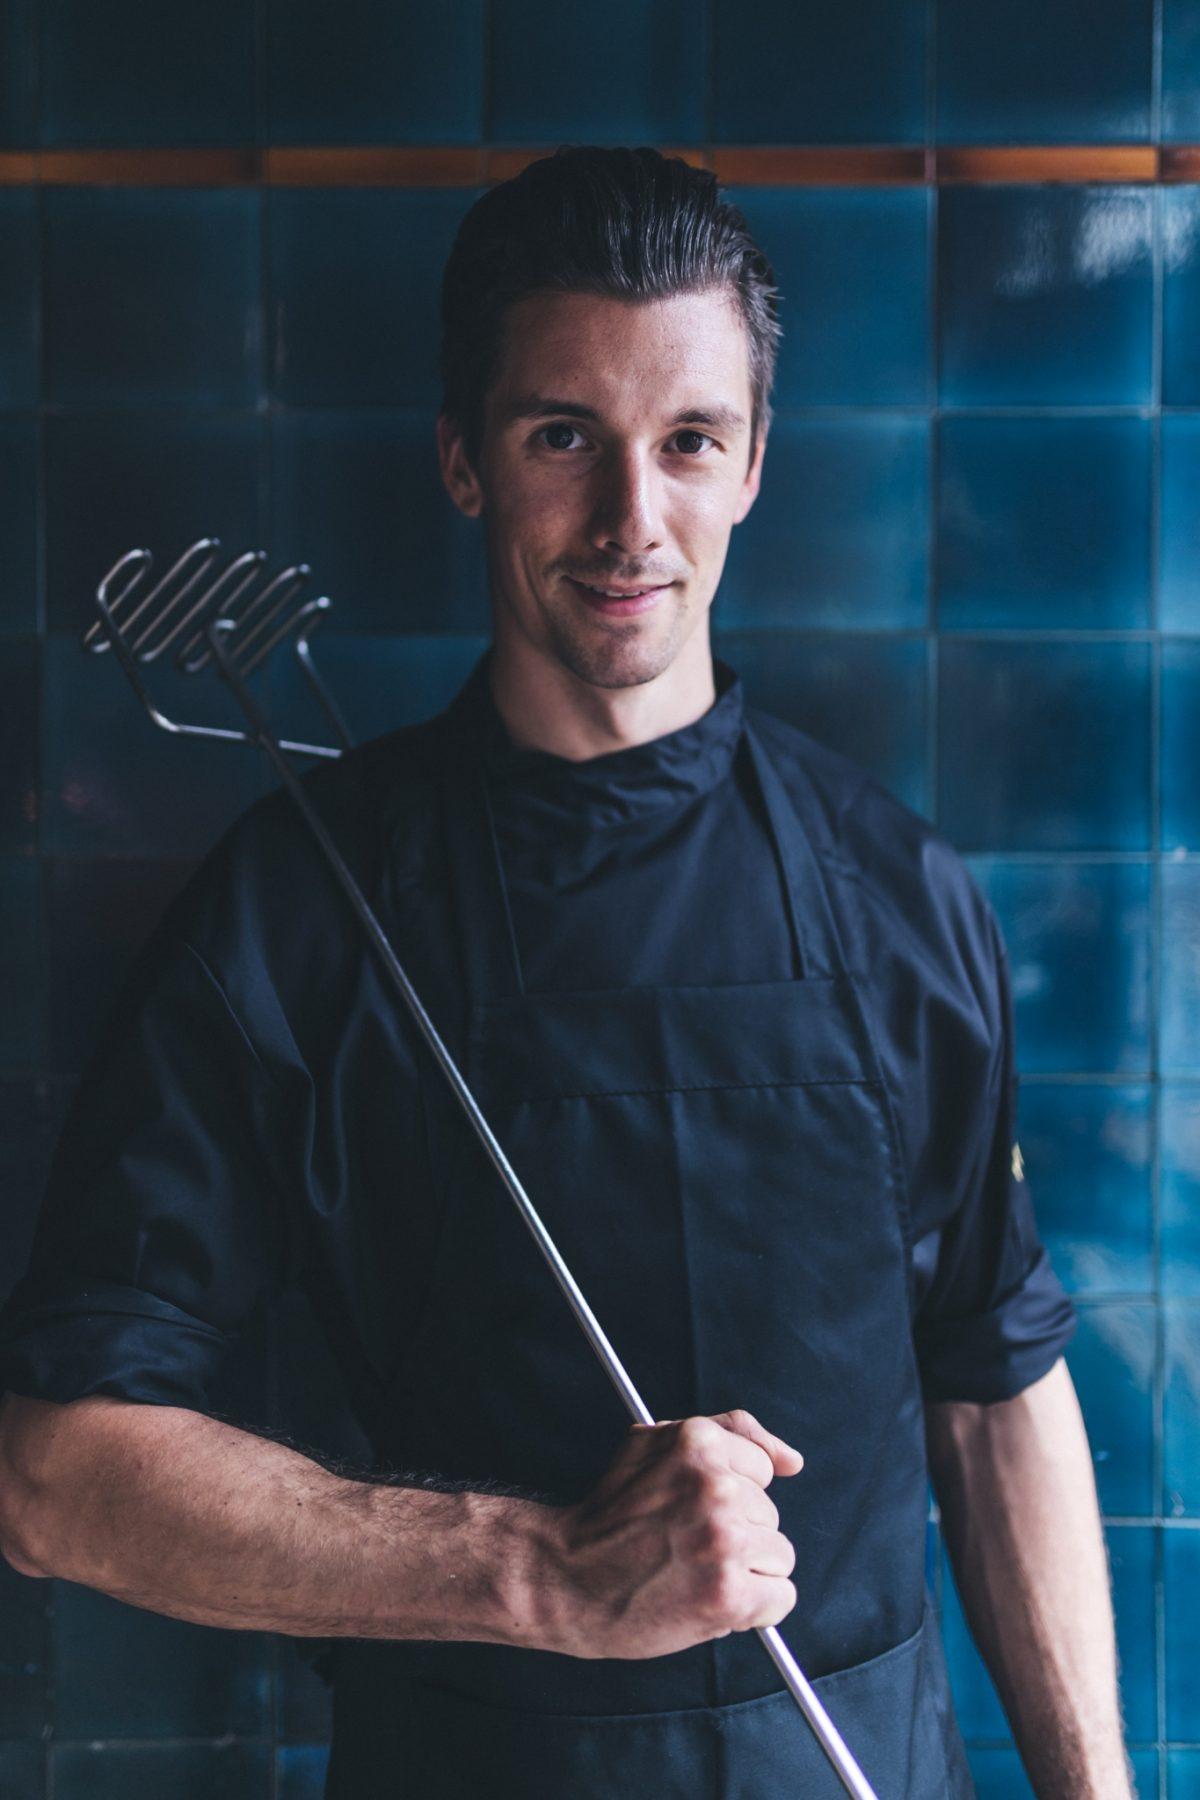 john in kitchen